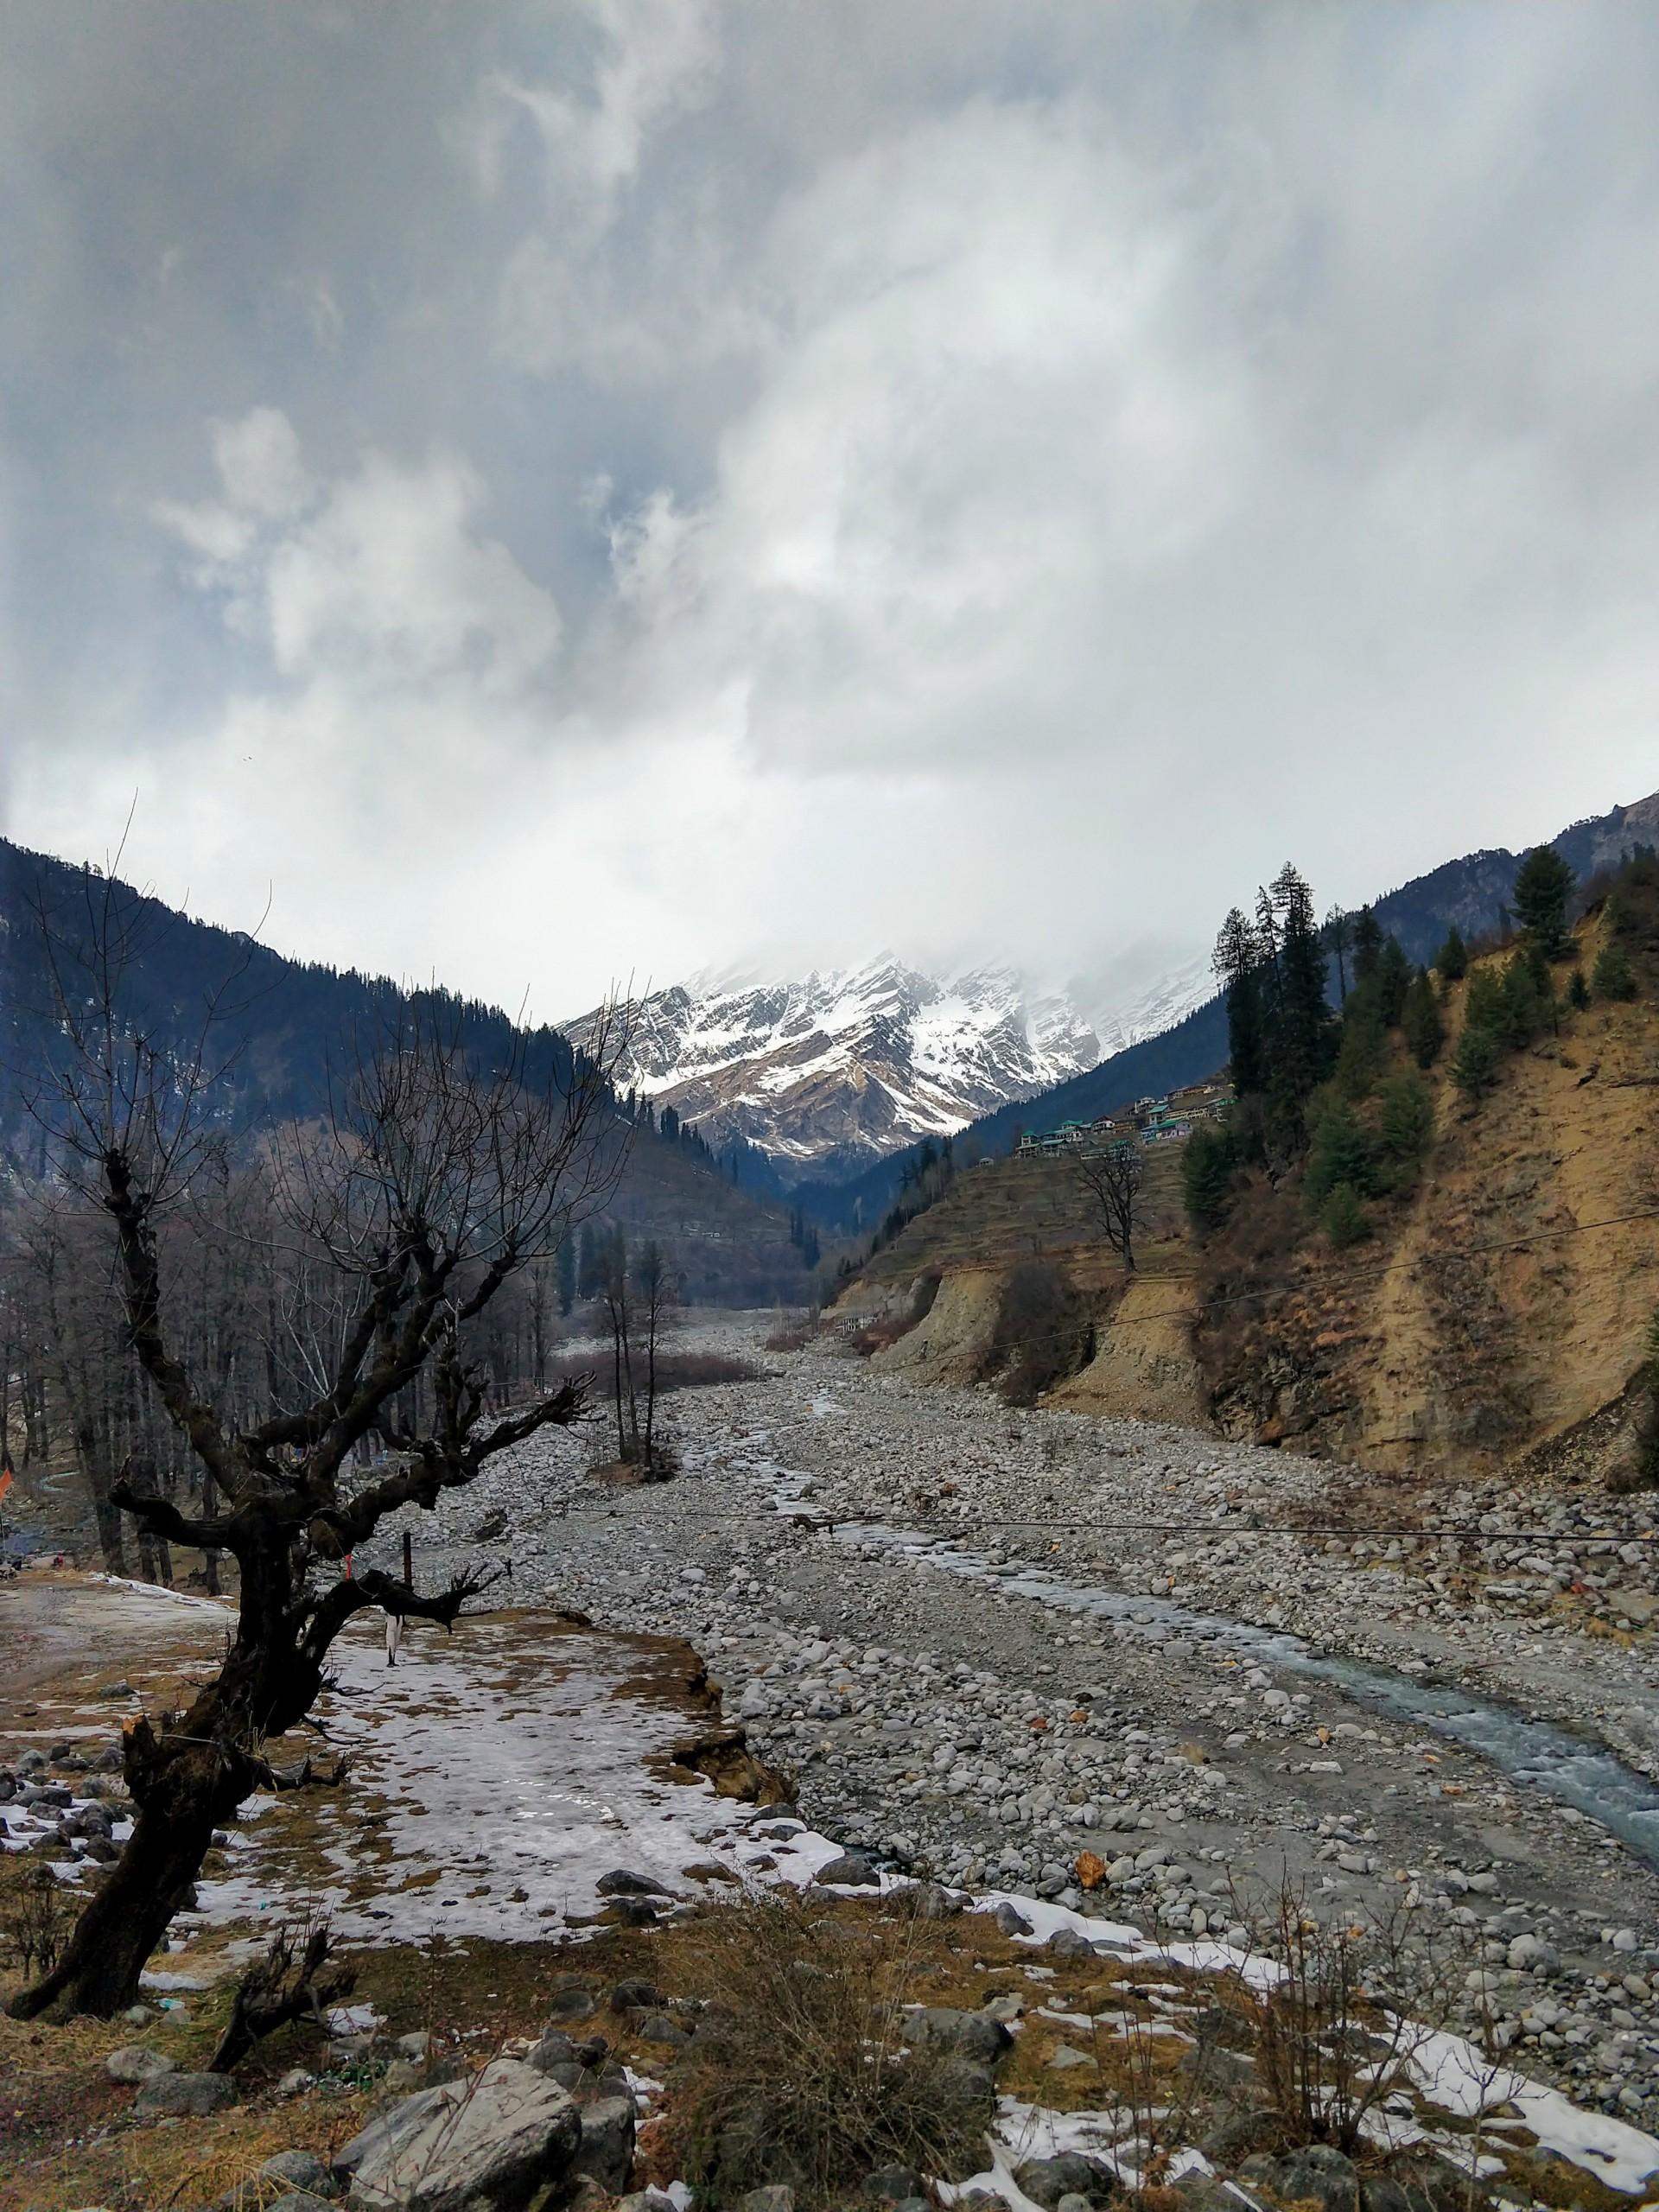 Aesthetic Himalayan landscape.